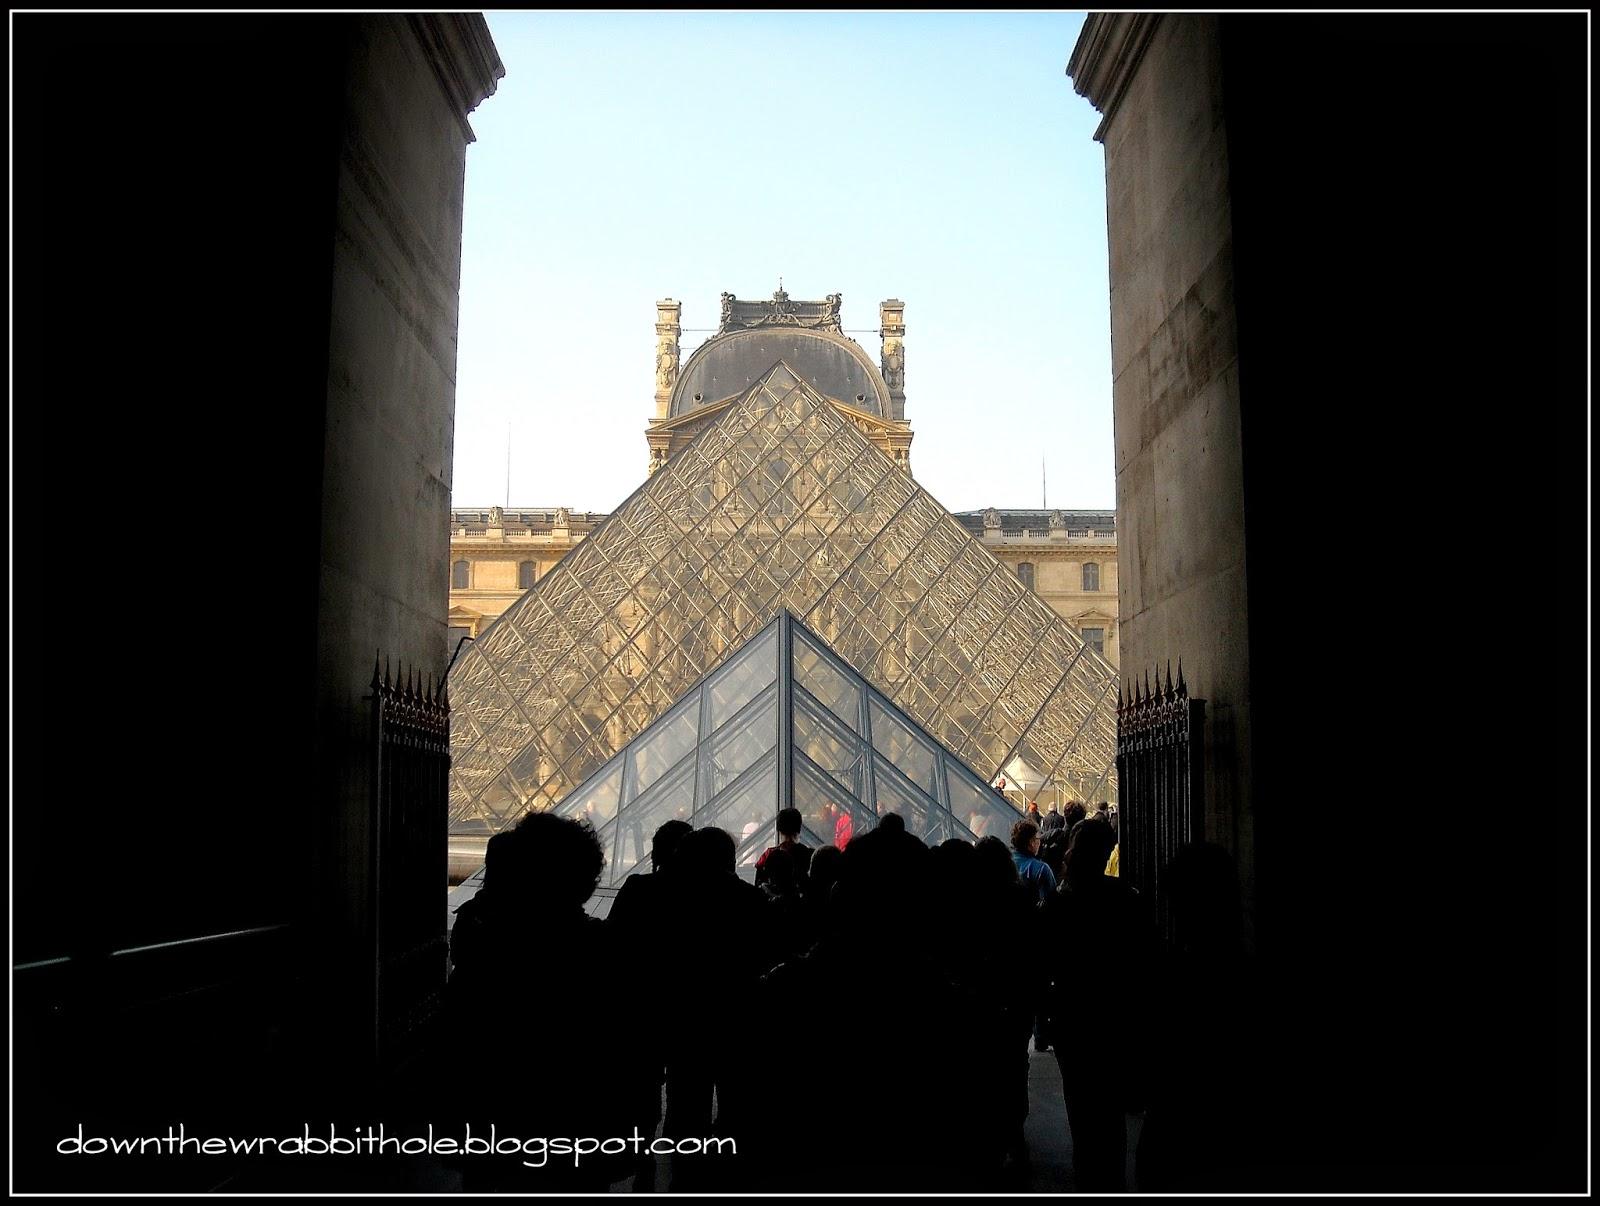 Paris, France, Louvre, Museum, Pyramids, Louvre Pyramid